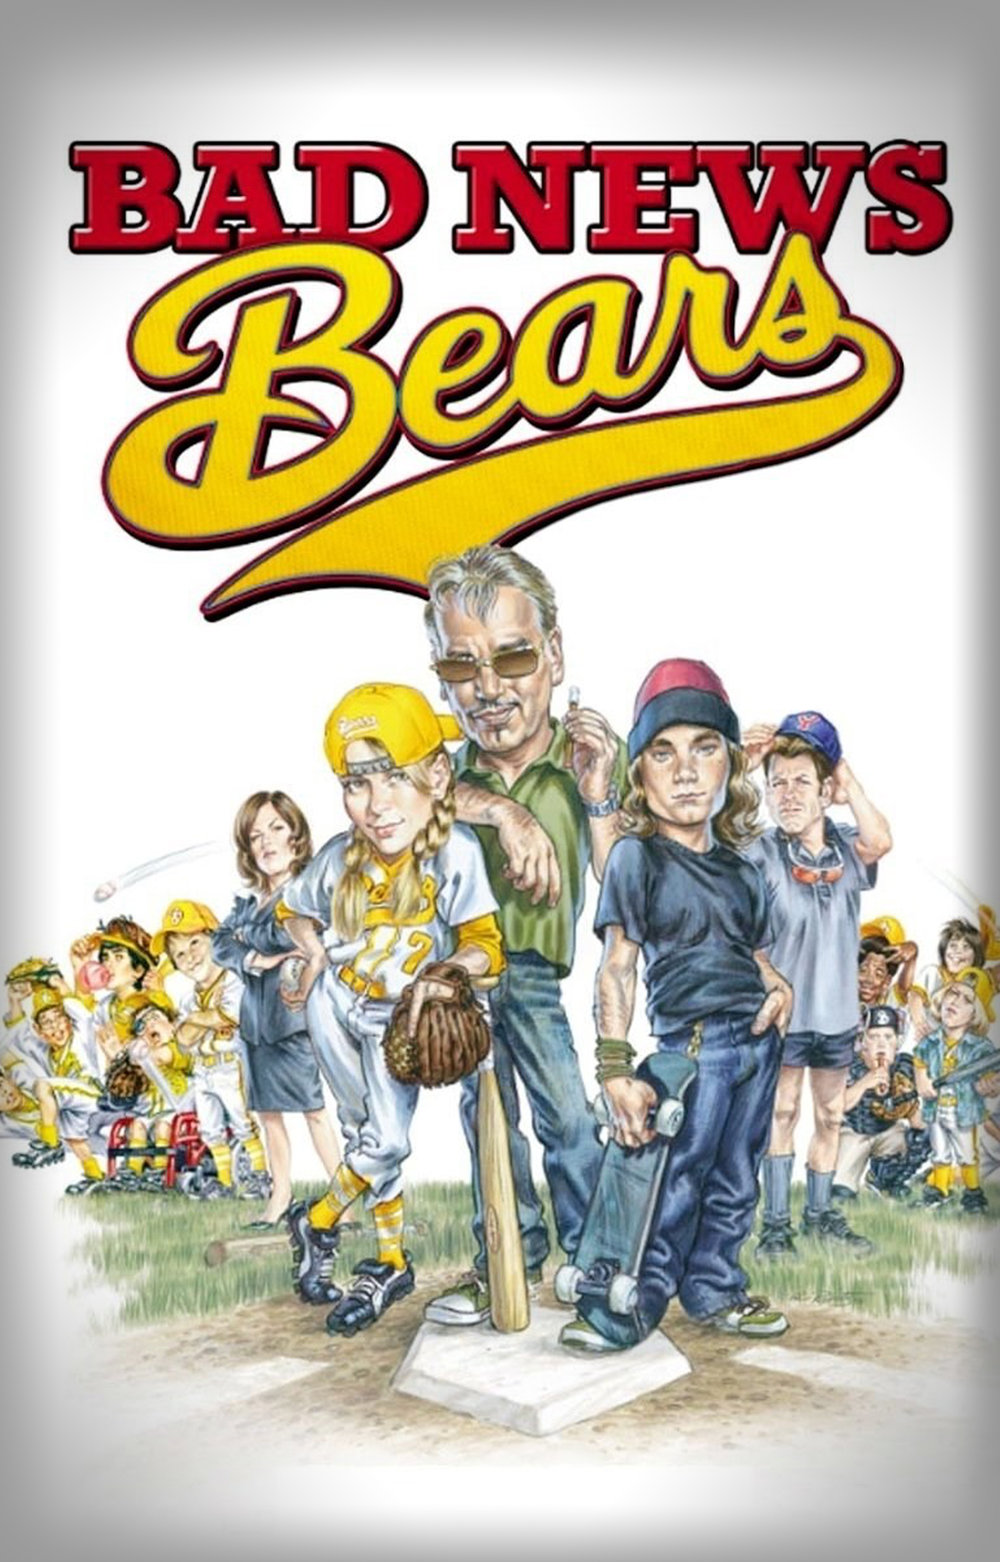 Bad News Bears Poster.jpg